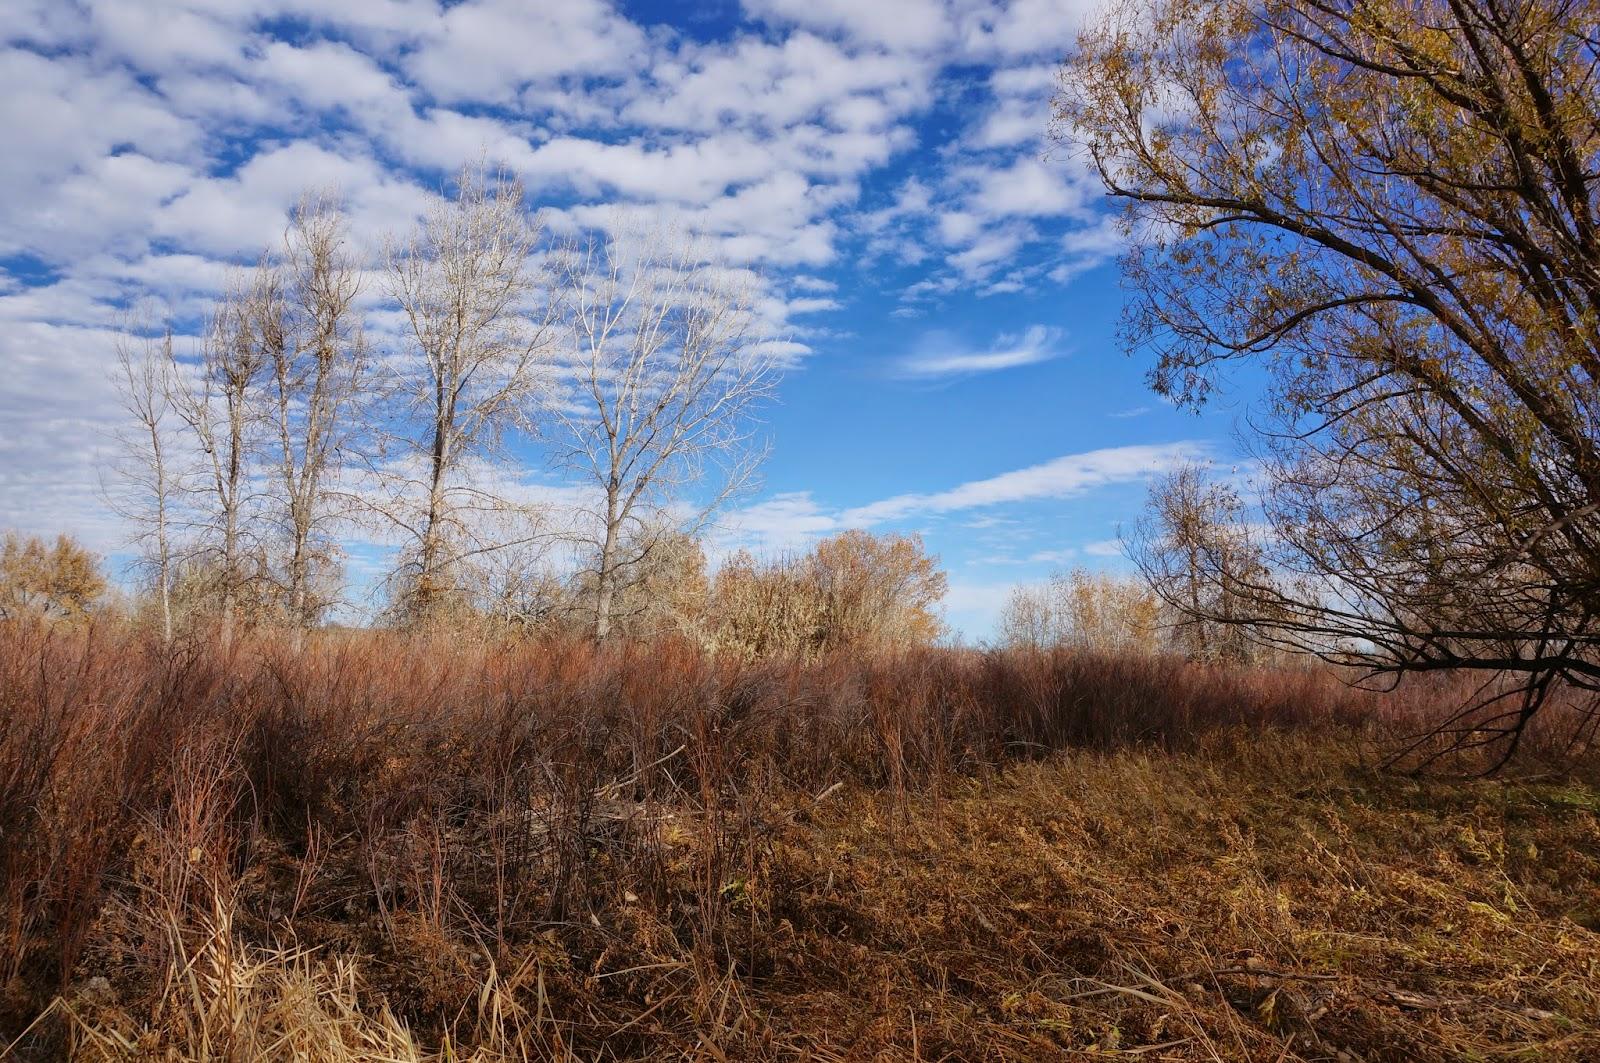 Go hike colorado wetlands preserve cherry creek state park for Cherry creek